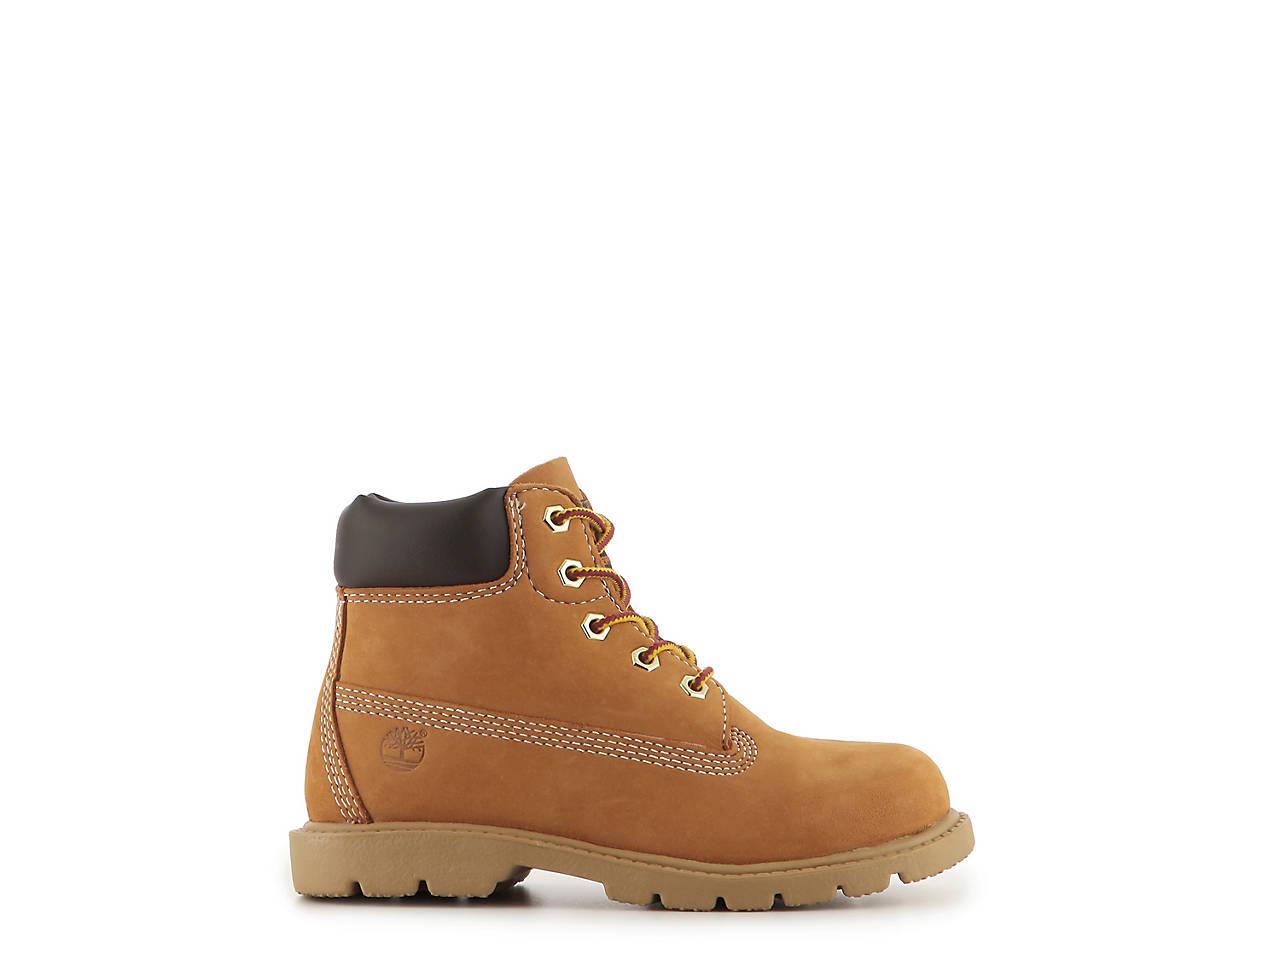 Kids Timberland 6 Inch Premium Waterproof Boot (Infant